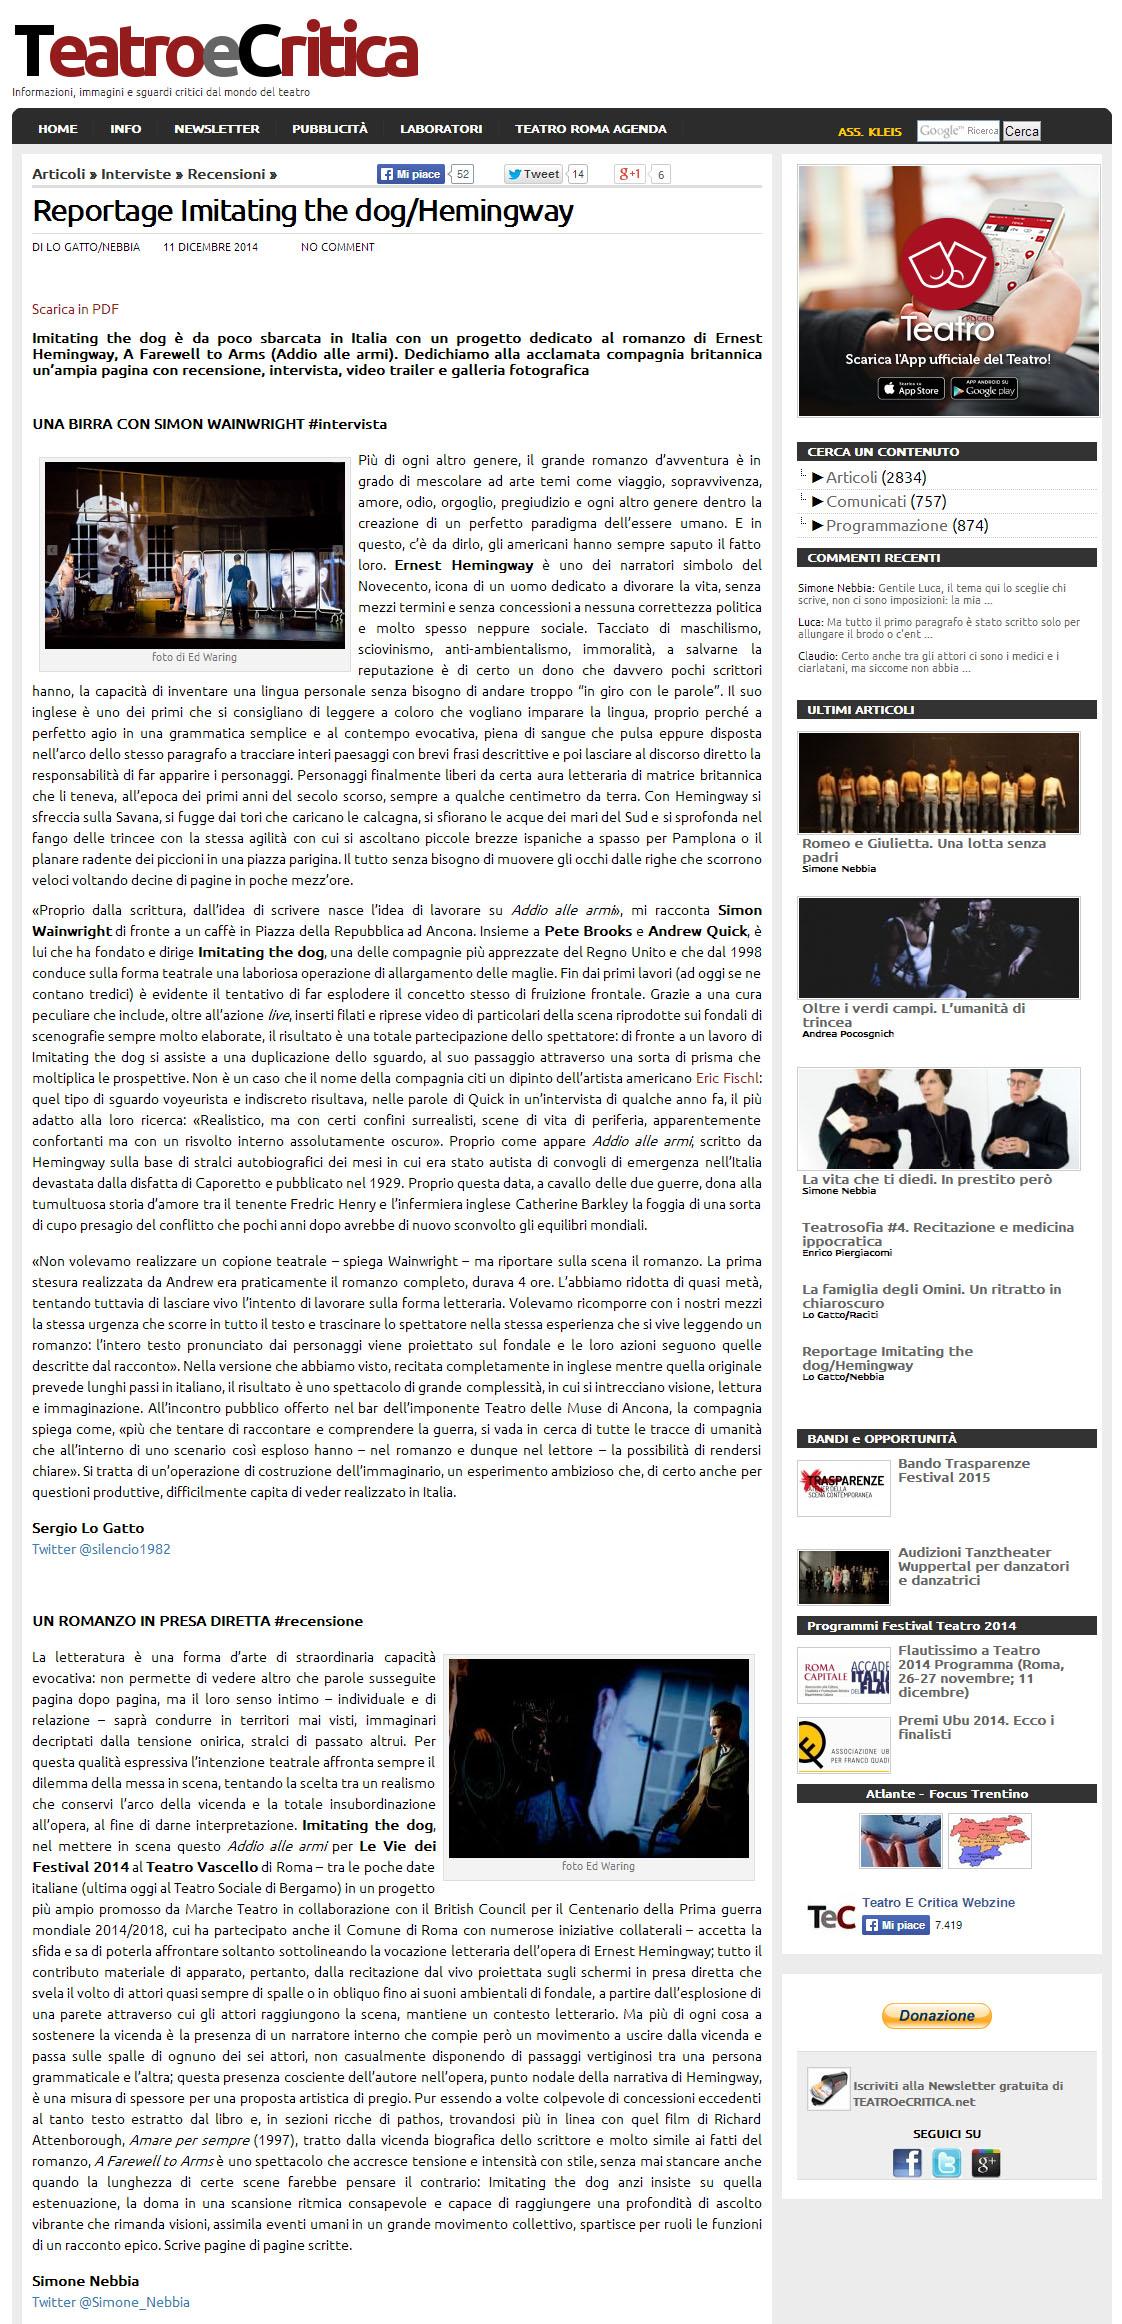 2014.12.11 reportage imitating the dog - teatroecritica.net